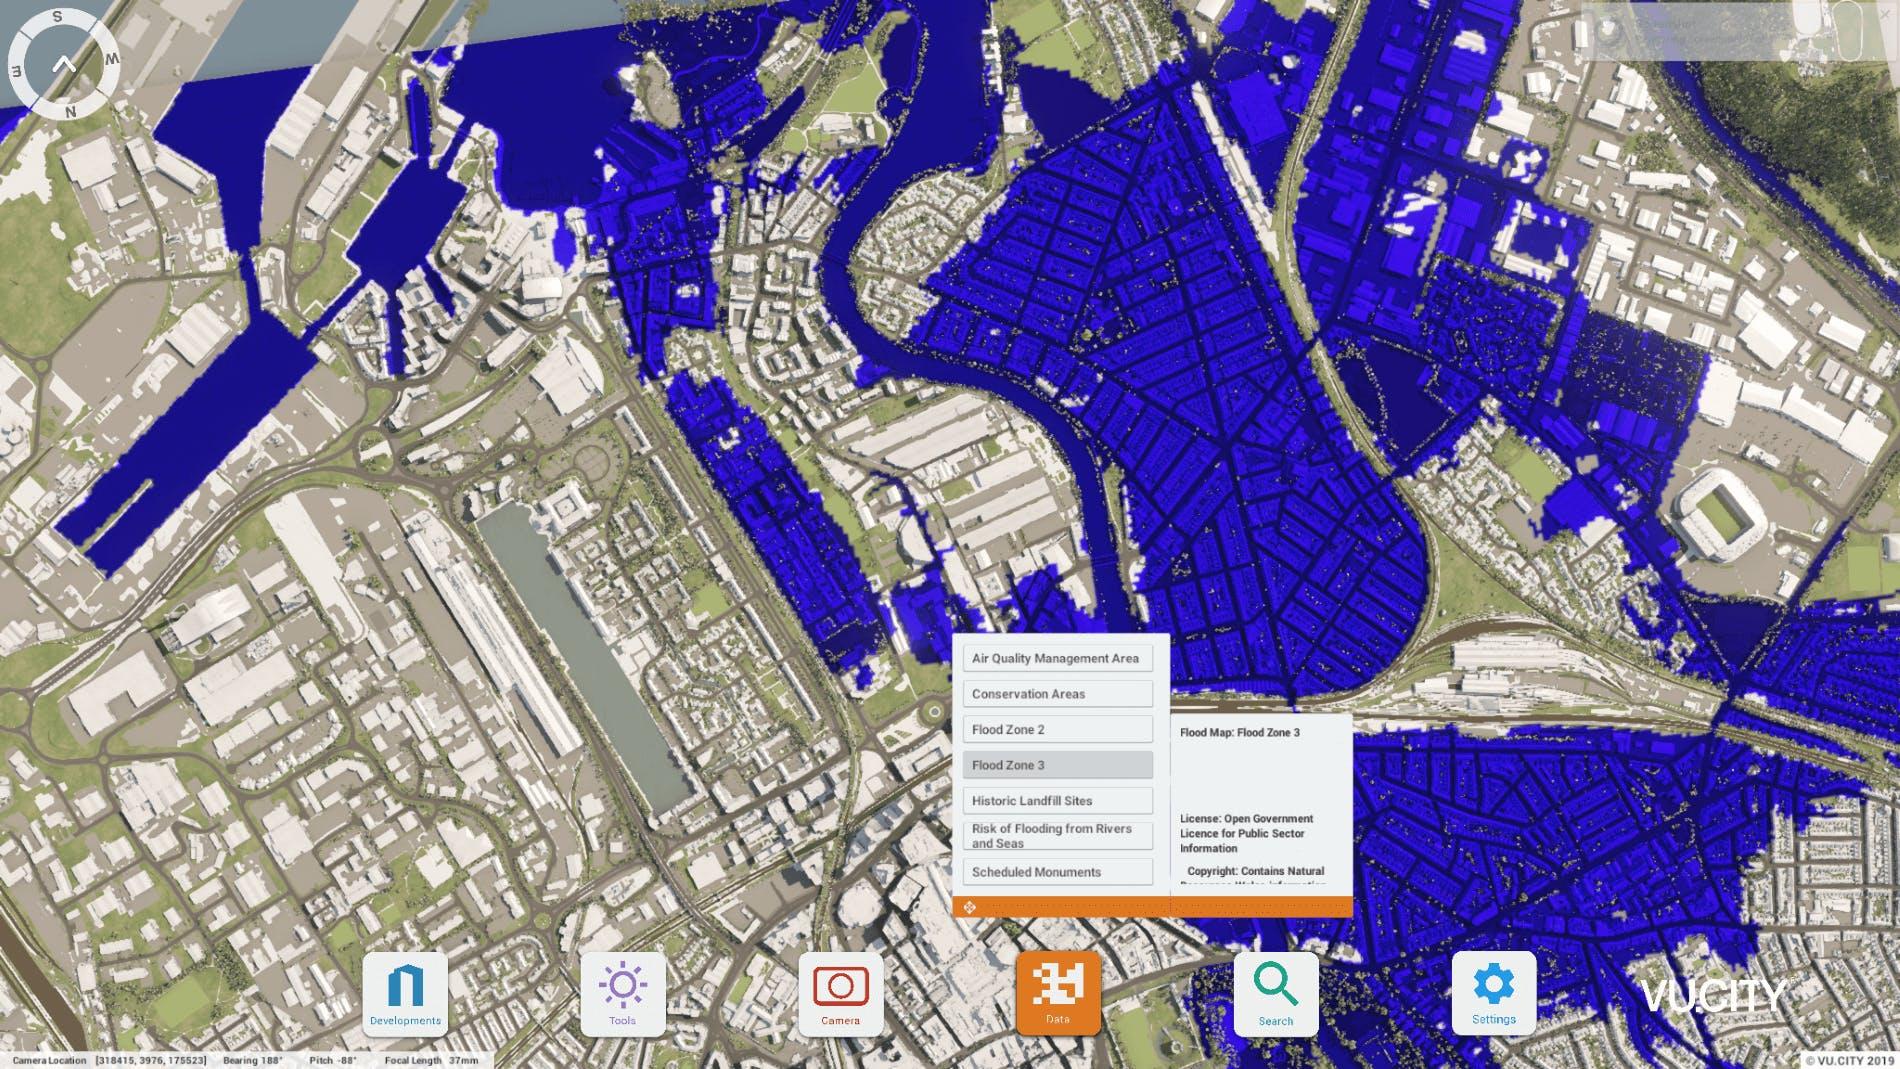 VU.CITY Cardiff flood zone 3